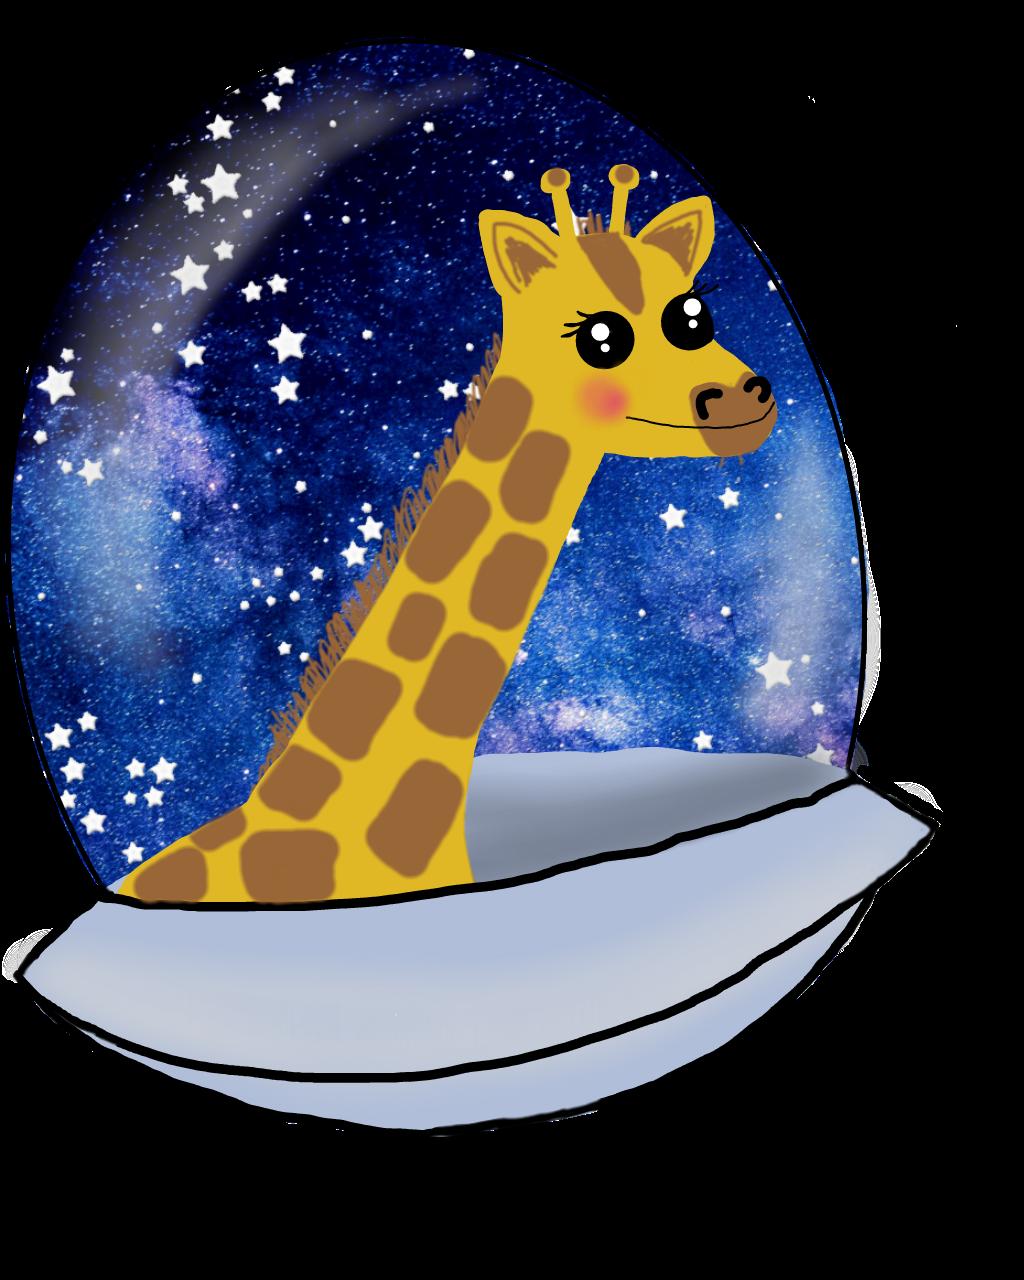 Ftegiraffe giraffe cosmic space. Galaxy clipart galactic